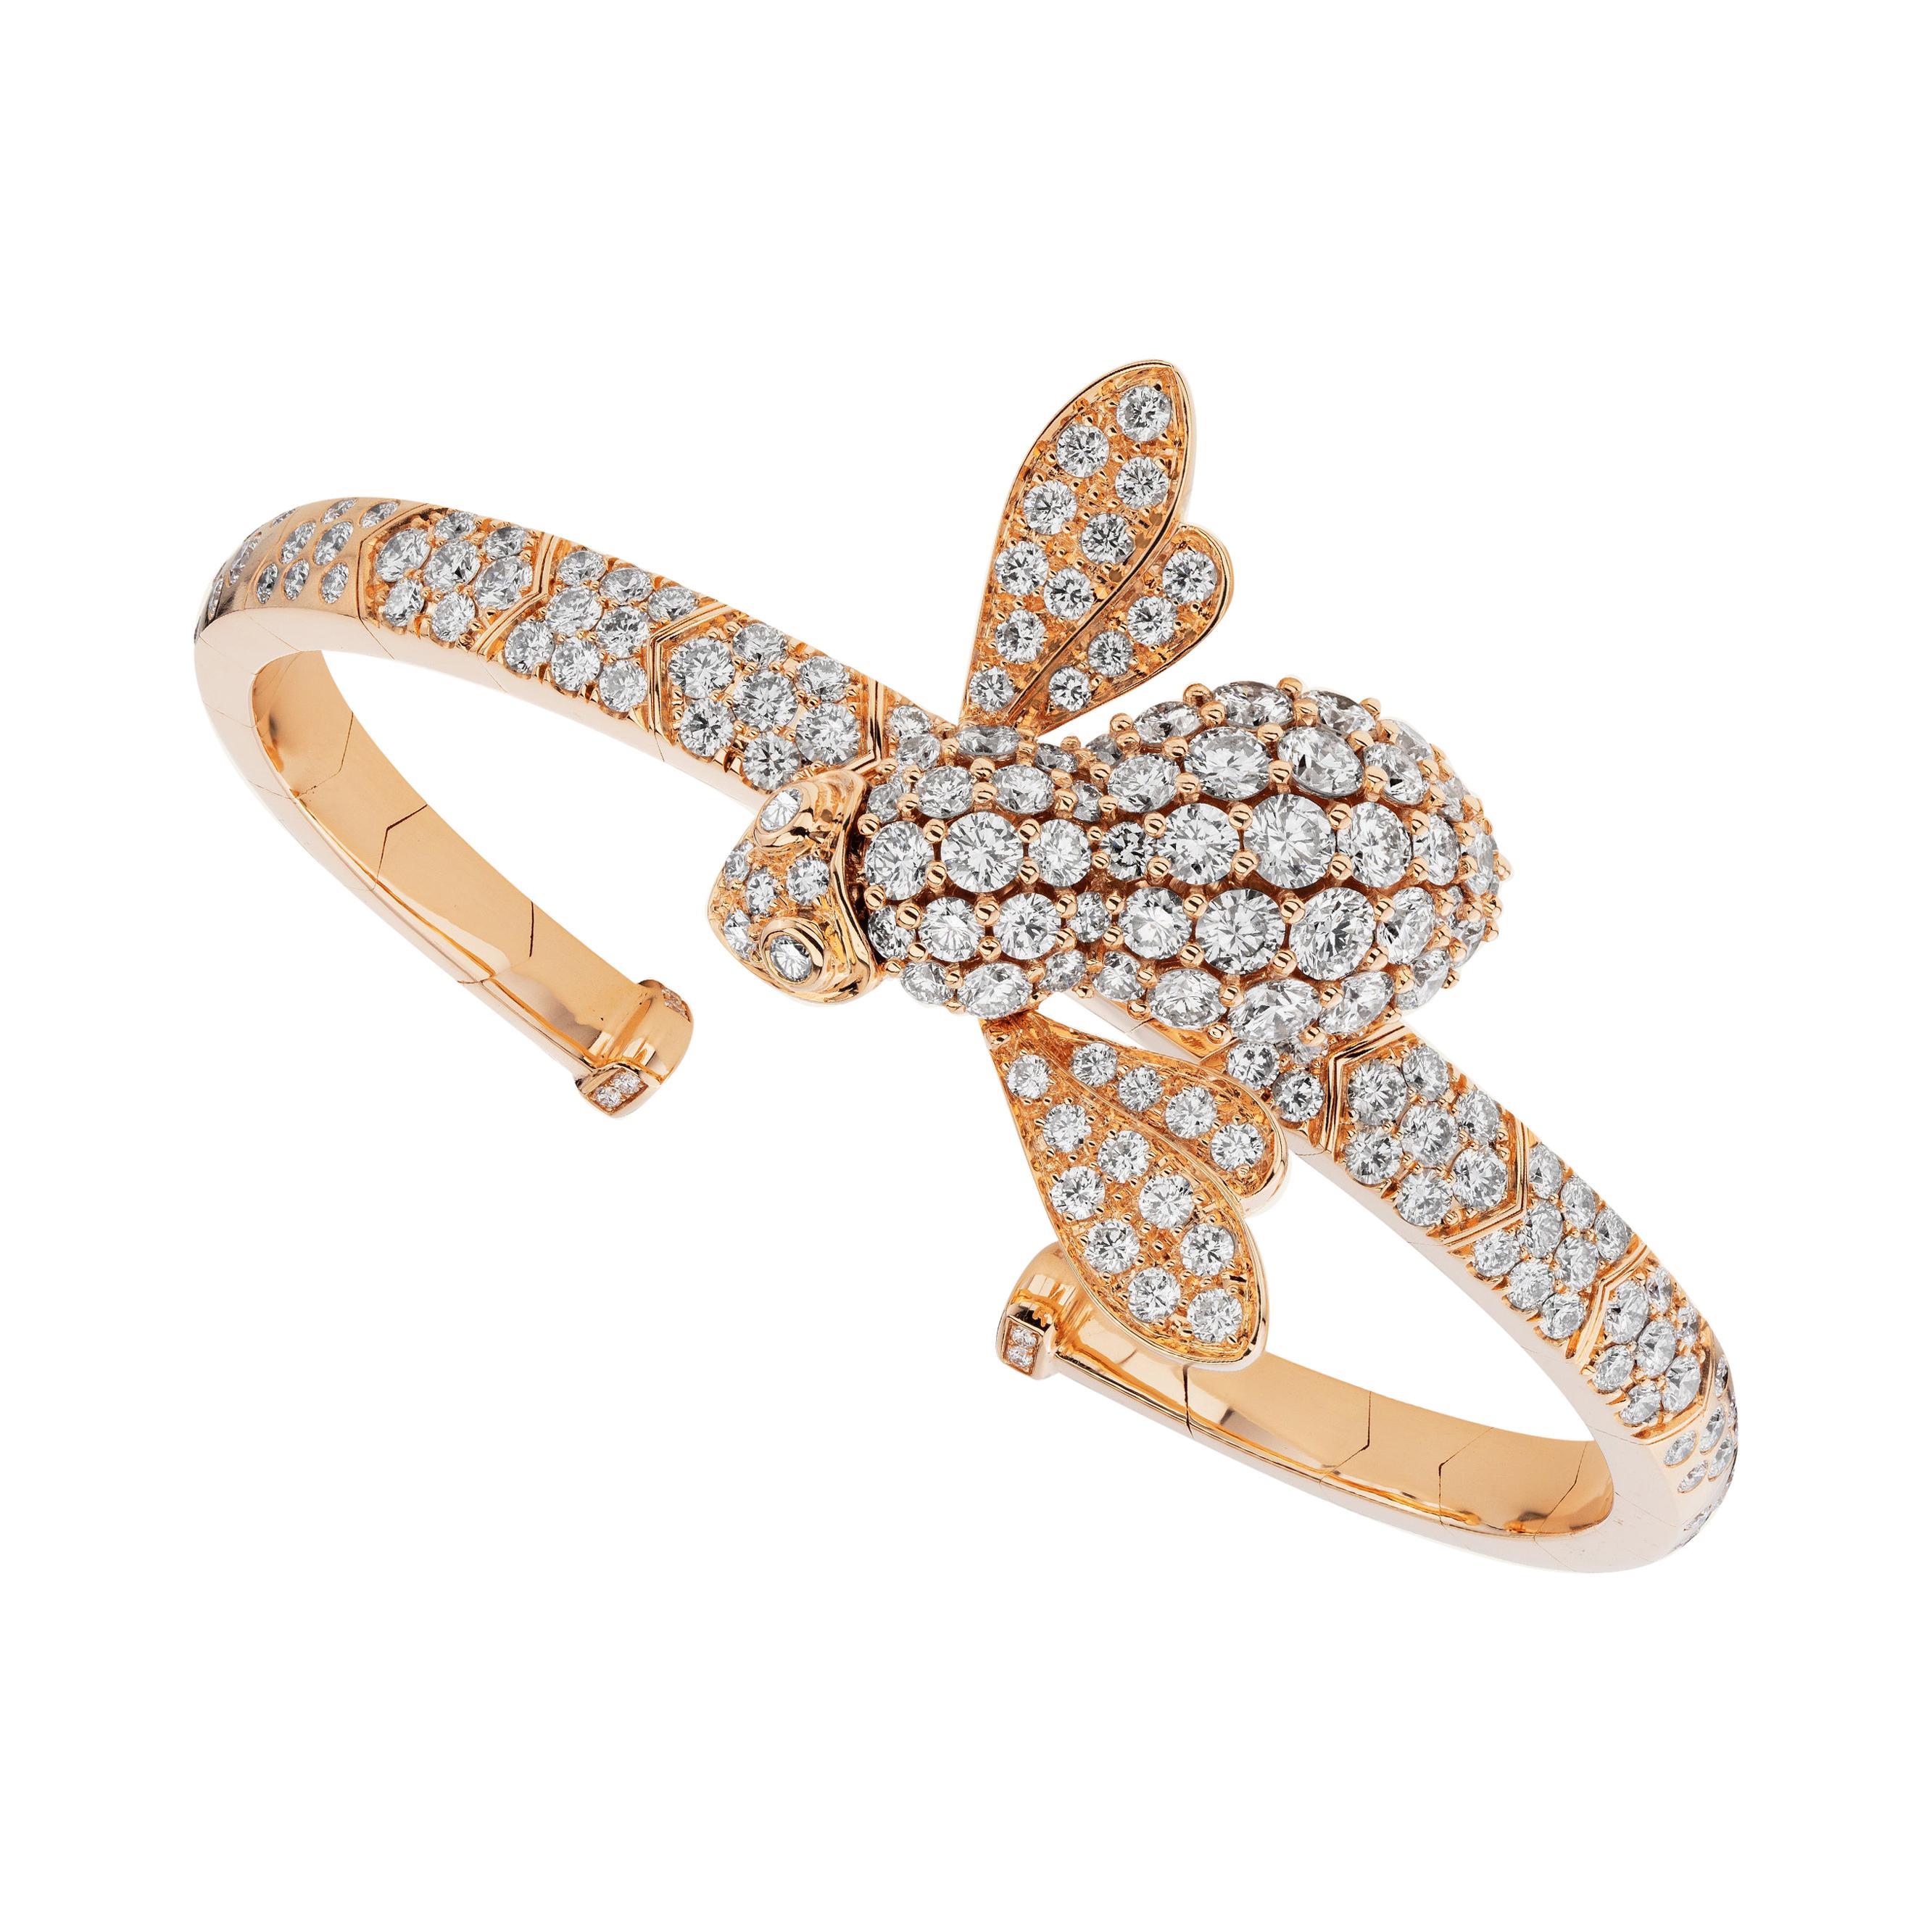 Sabbadini Bee Bracelet in Titanium, Diamonds & Pink Gold